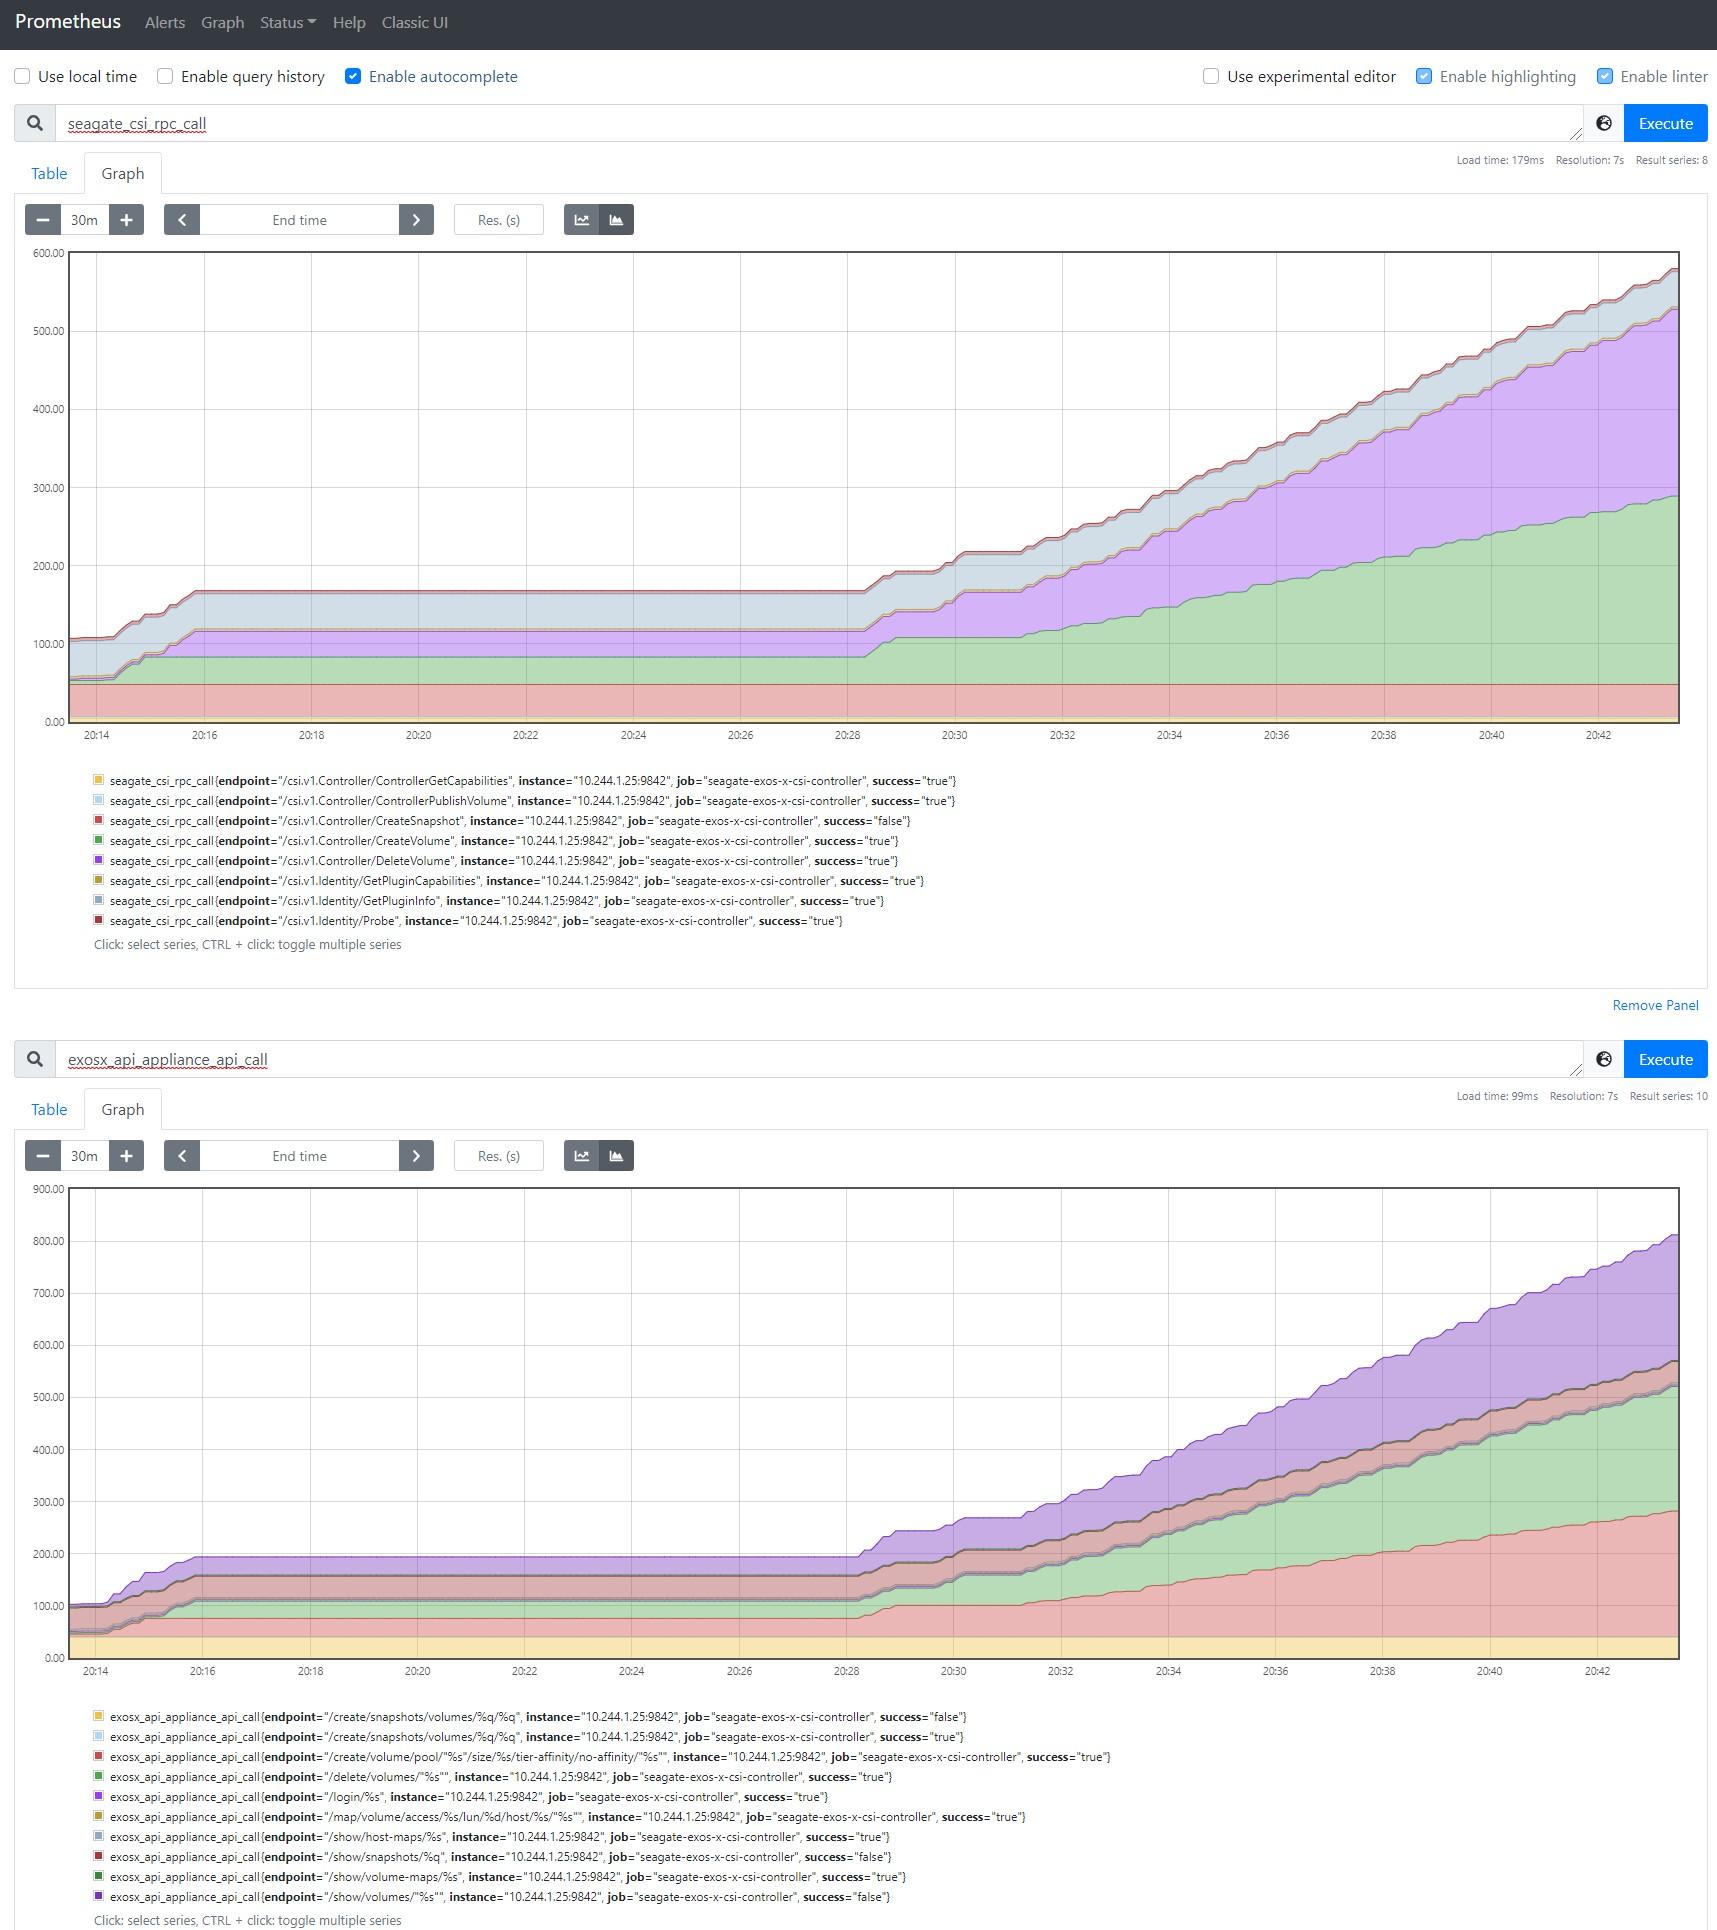 Sample Prometheus graphs showing various CSI driver statistics